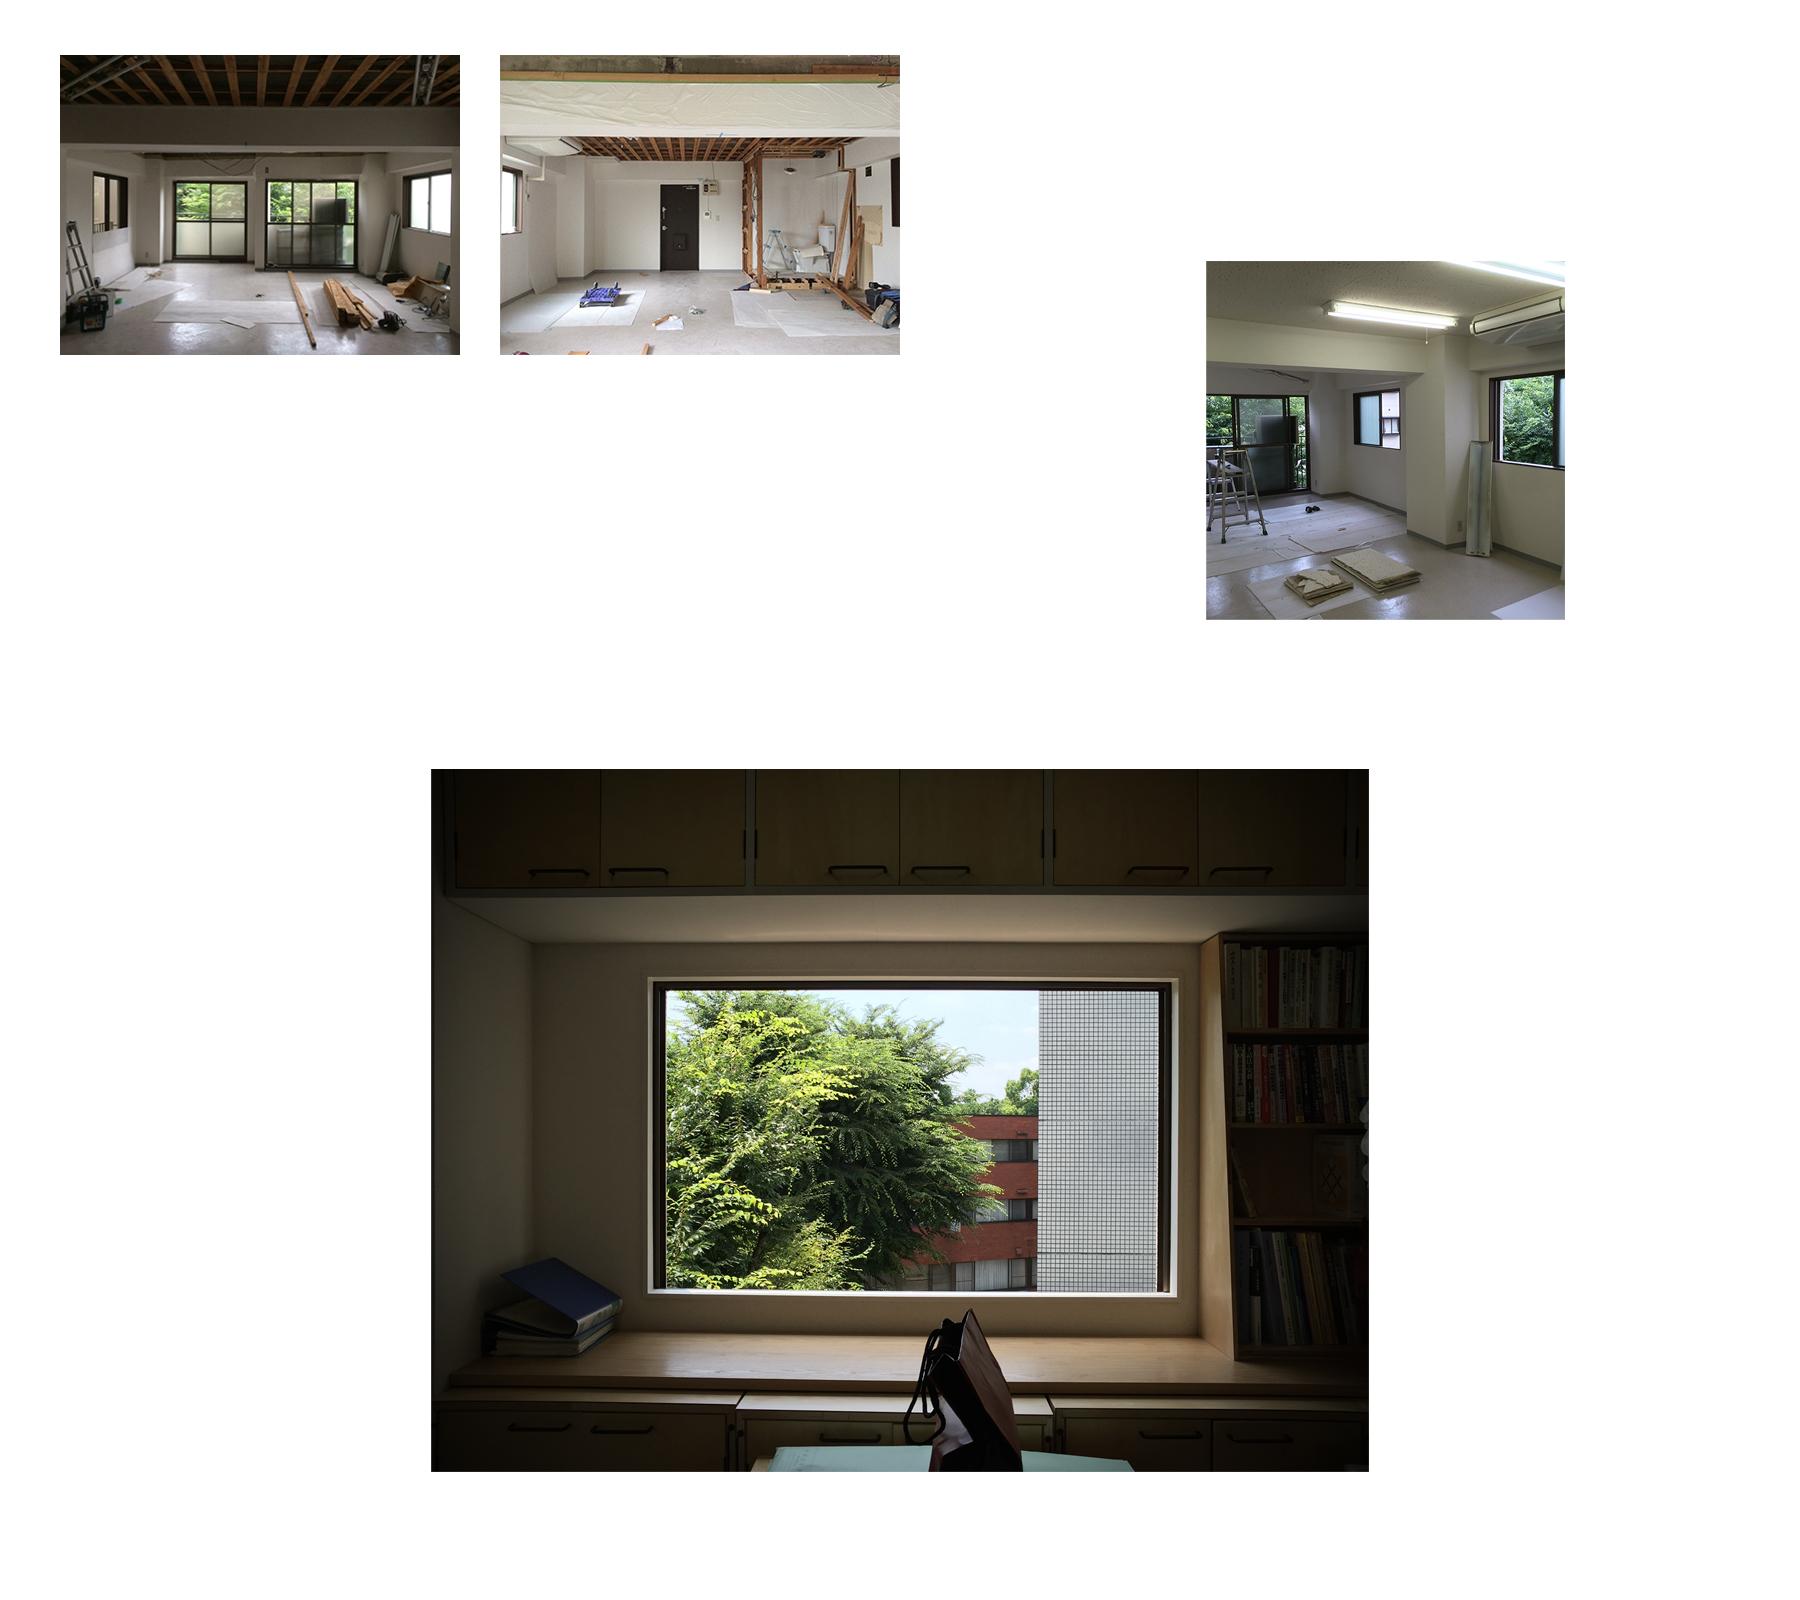 Interior Design Youki Higa Contract Studio Pathofeu Photo Tae Nakayama Principal Use Law Office Total Floor Area 54m2 Building Site Gotenyama